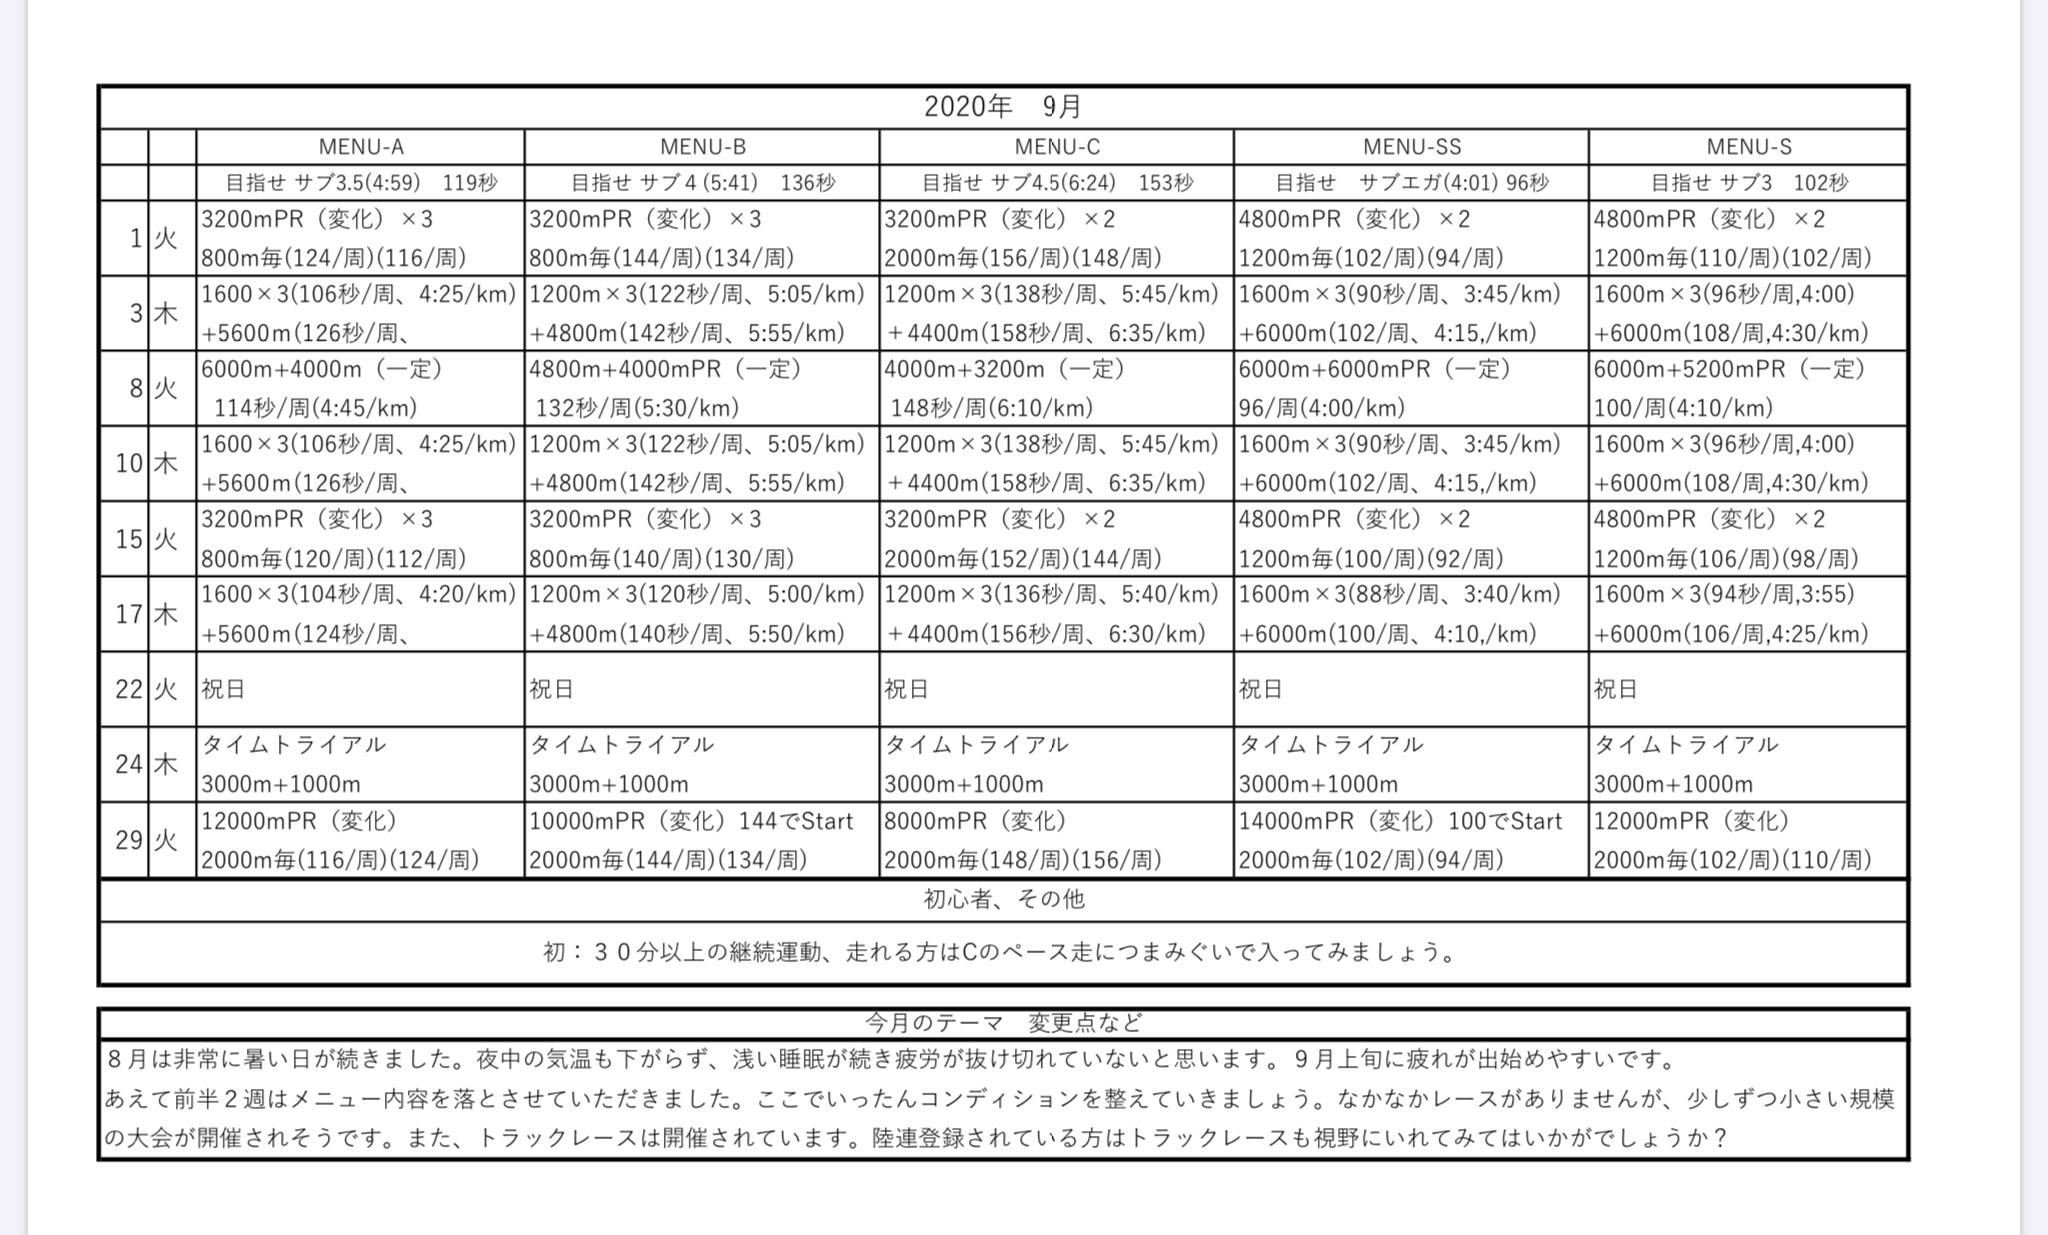 13F5A10D-418A-4703-87E6-A20EE17A6336